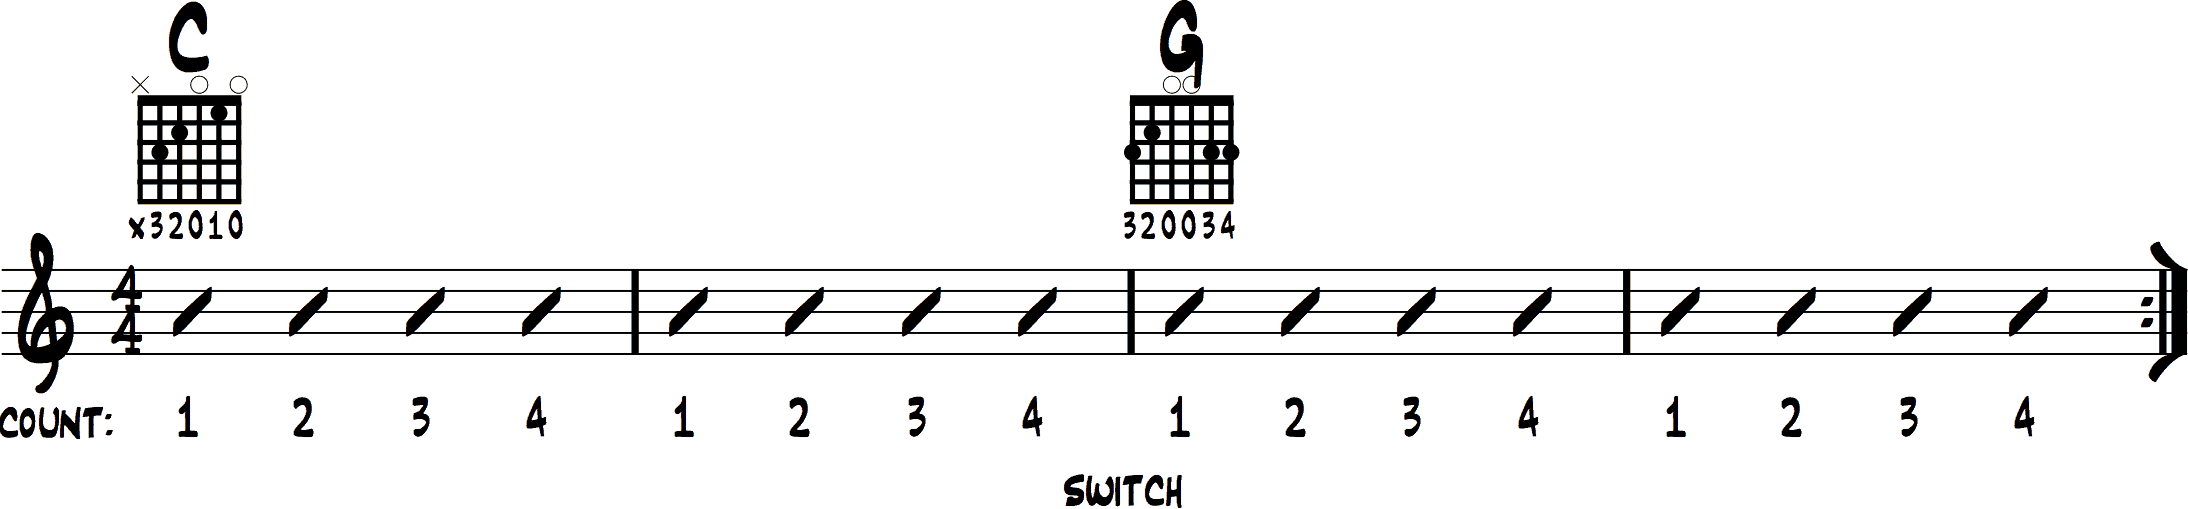 Guitar Chord Example 8